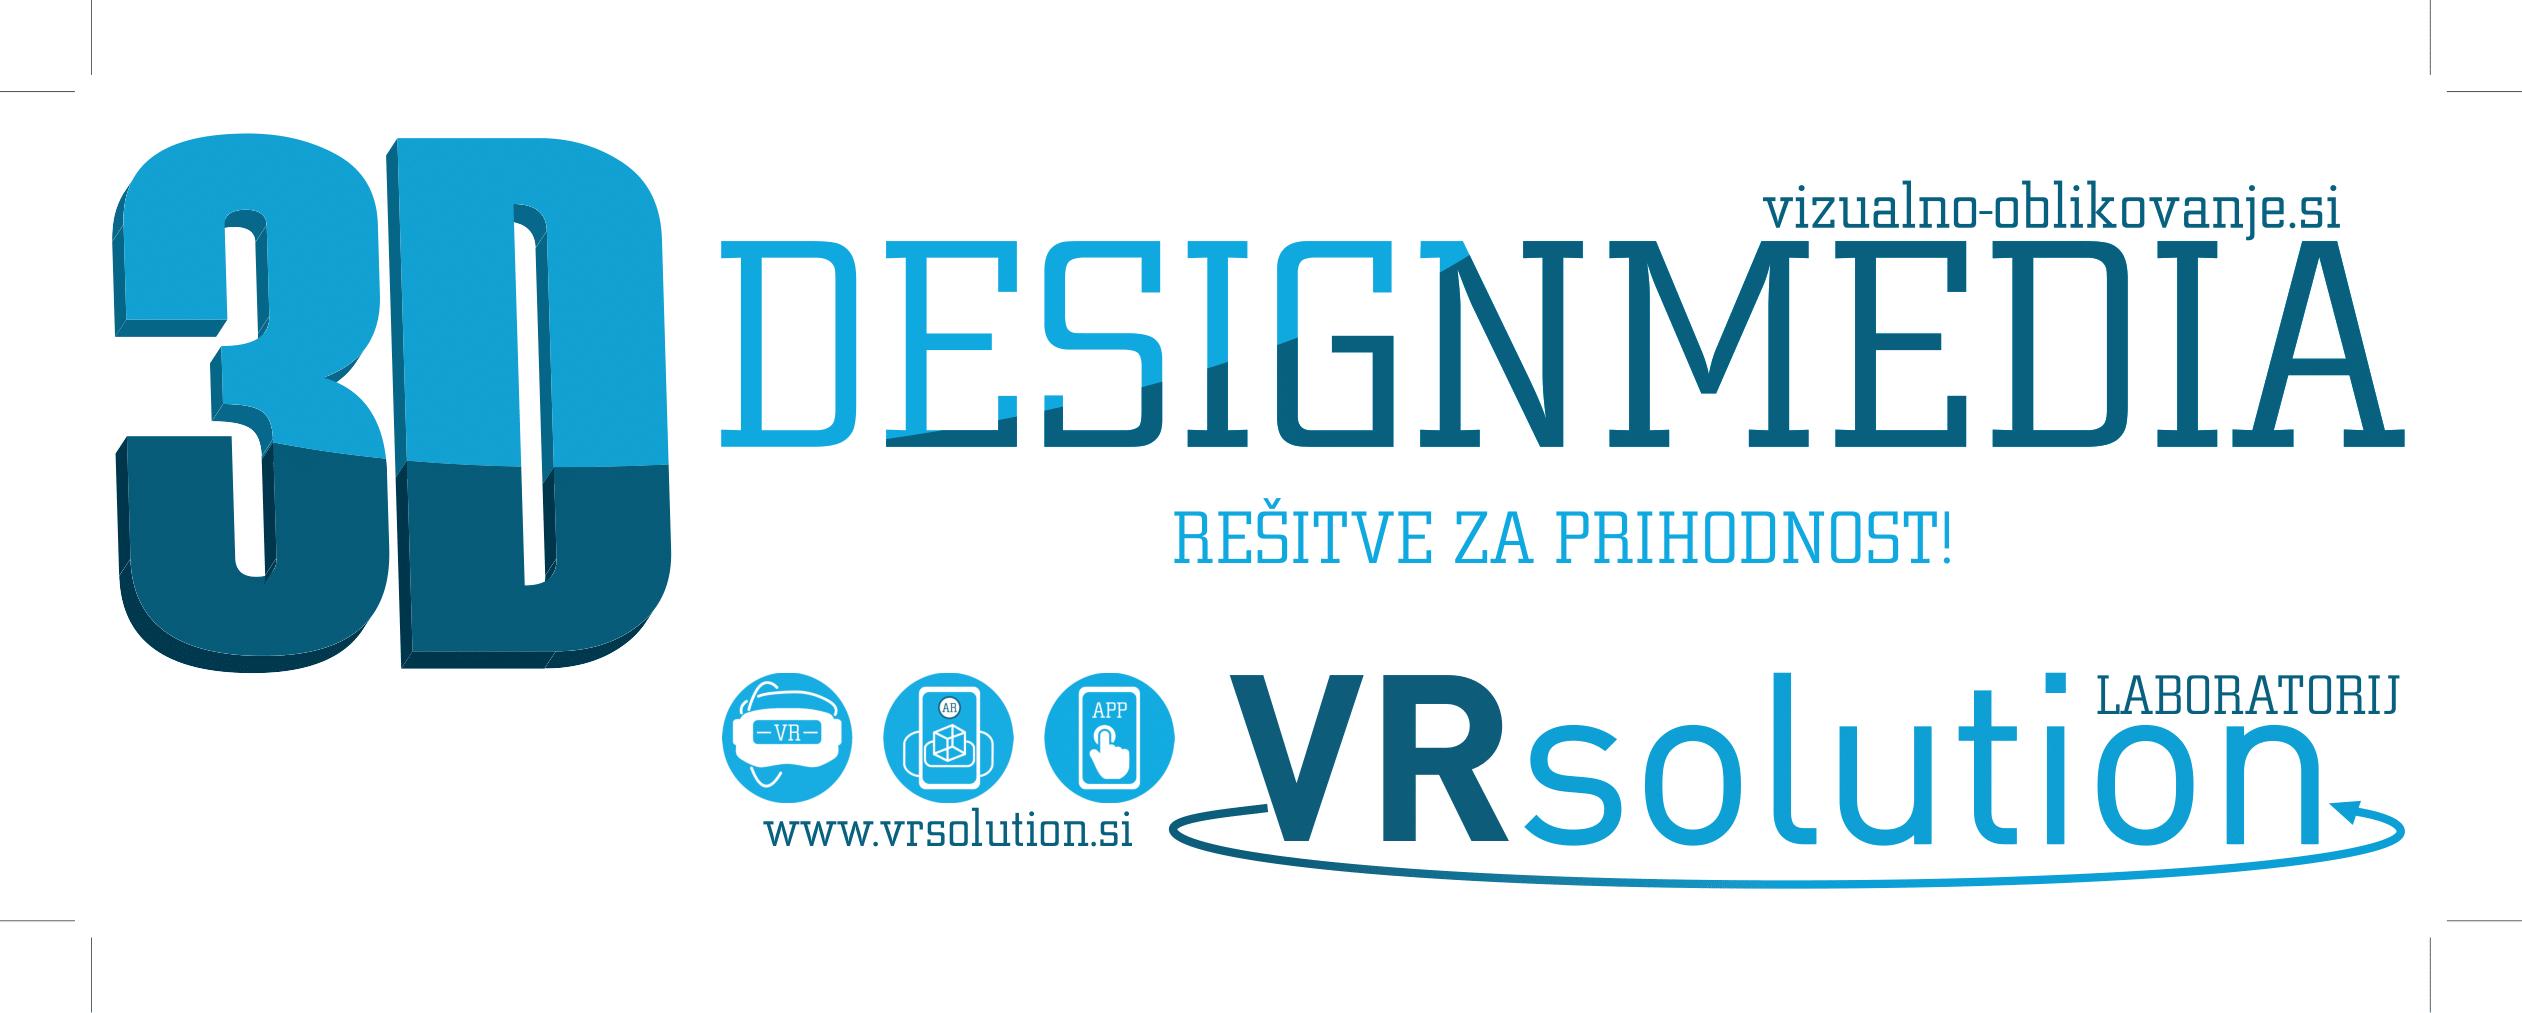 3D Design Media, Grafično oblikovanje Tatjana Grunt Novak s.p.